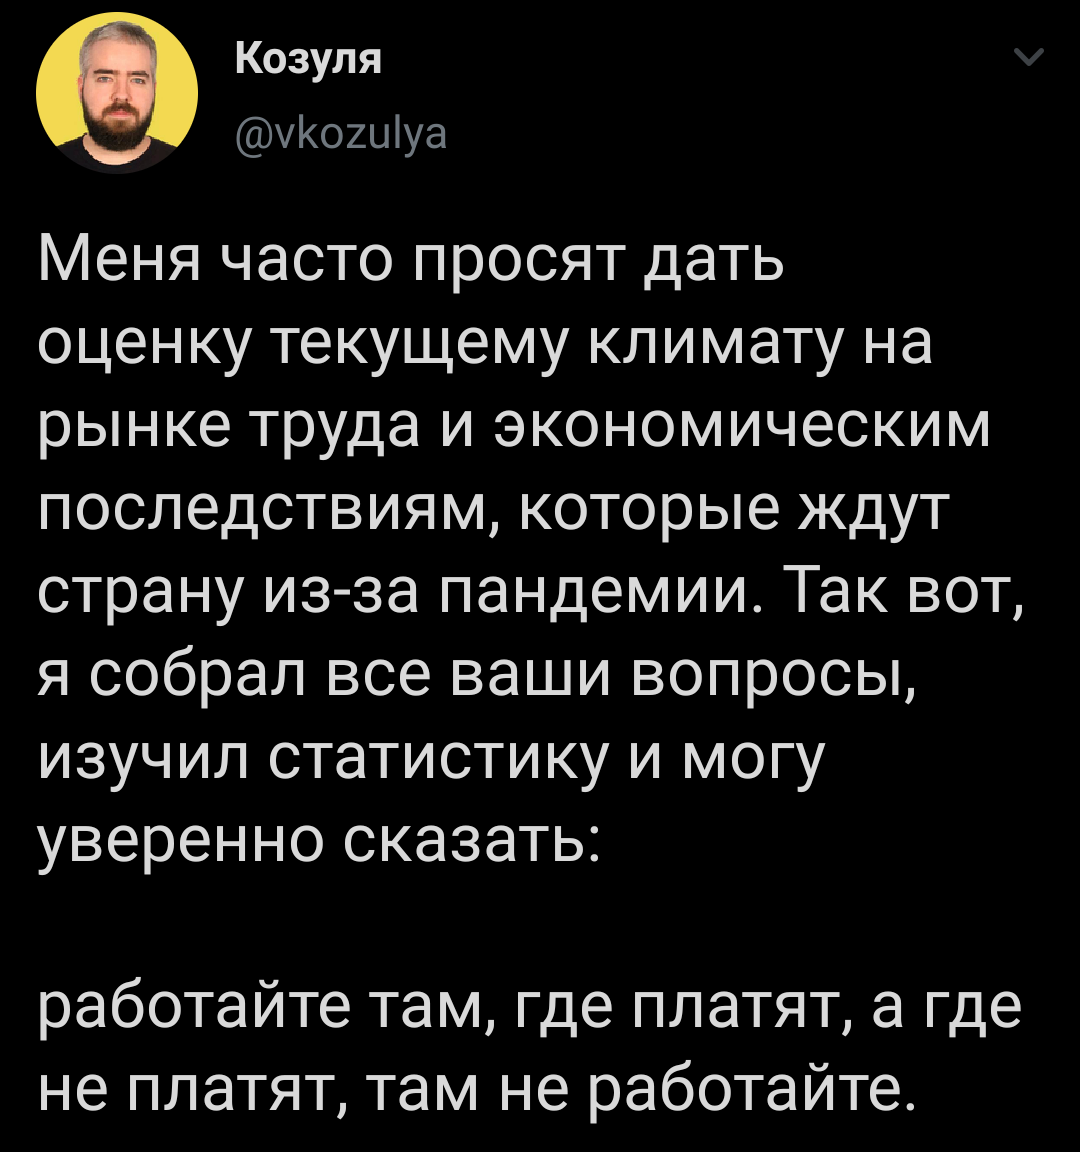 https://cs10.pikabu.ru/post_img/big/2020/04/23/7/1587637174137370007.png